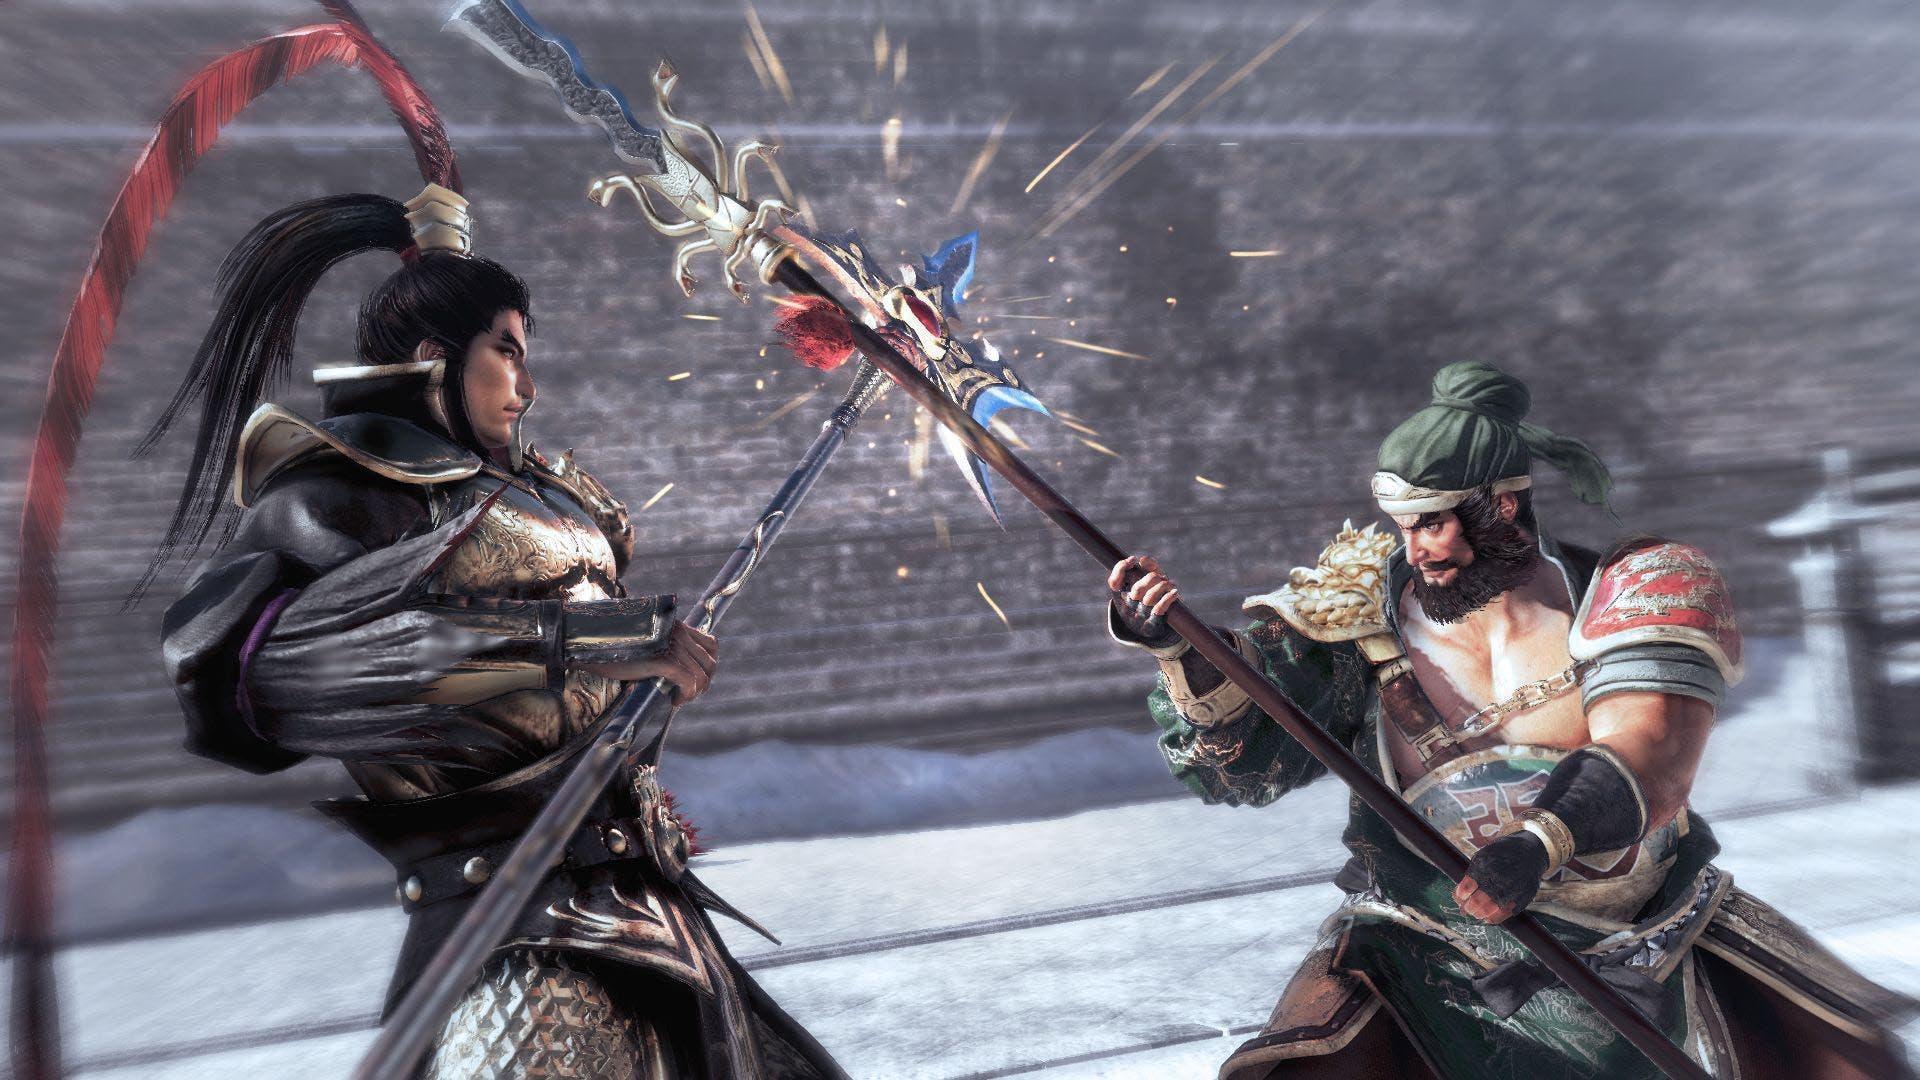 Análisis de Dynasty Warriors 9 - Xbox One 6